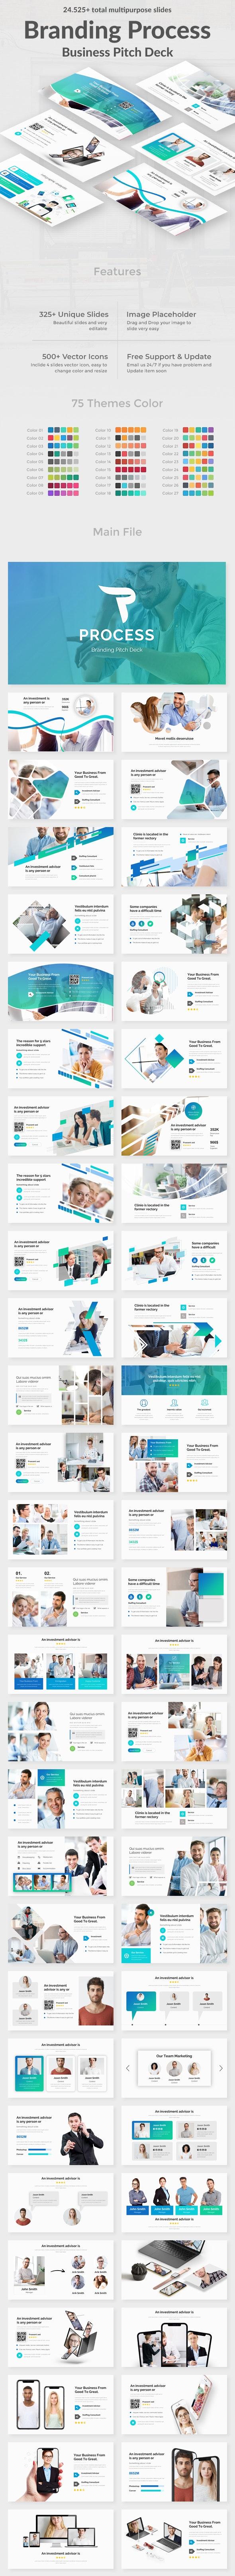 Branding Process Powerpoint Pitch Deck Template - Business PowerPoint Templates